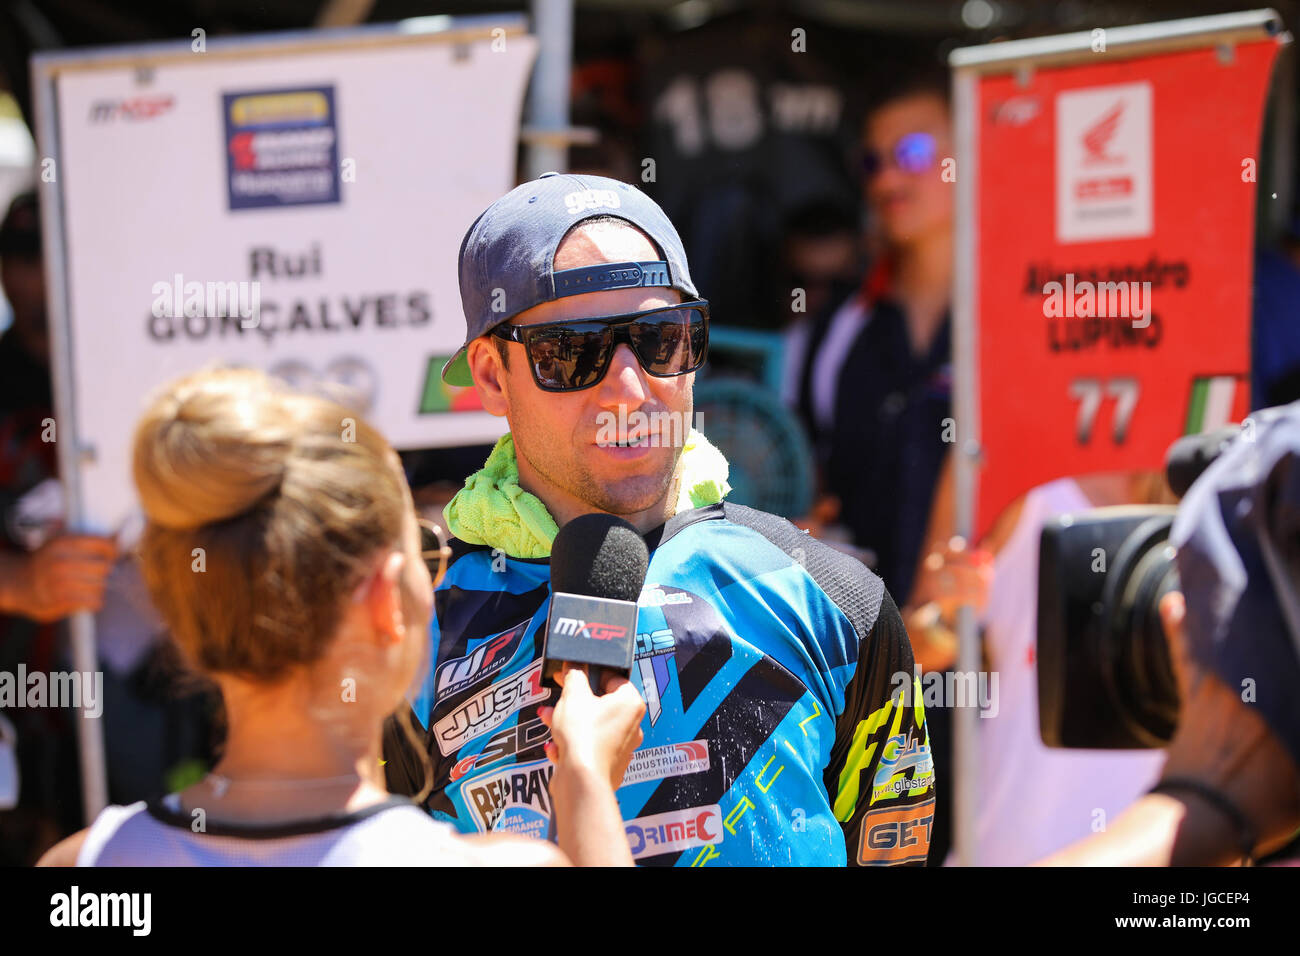 Rui Goncalves #999 (POR) in Husqvarna of 8Biano Racing Husqvarna in action during the MXGP World Championship 2017 - Stock Image